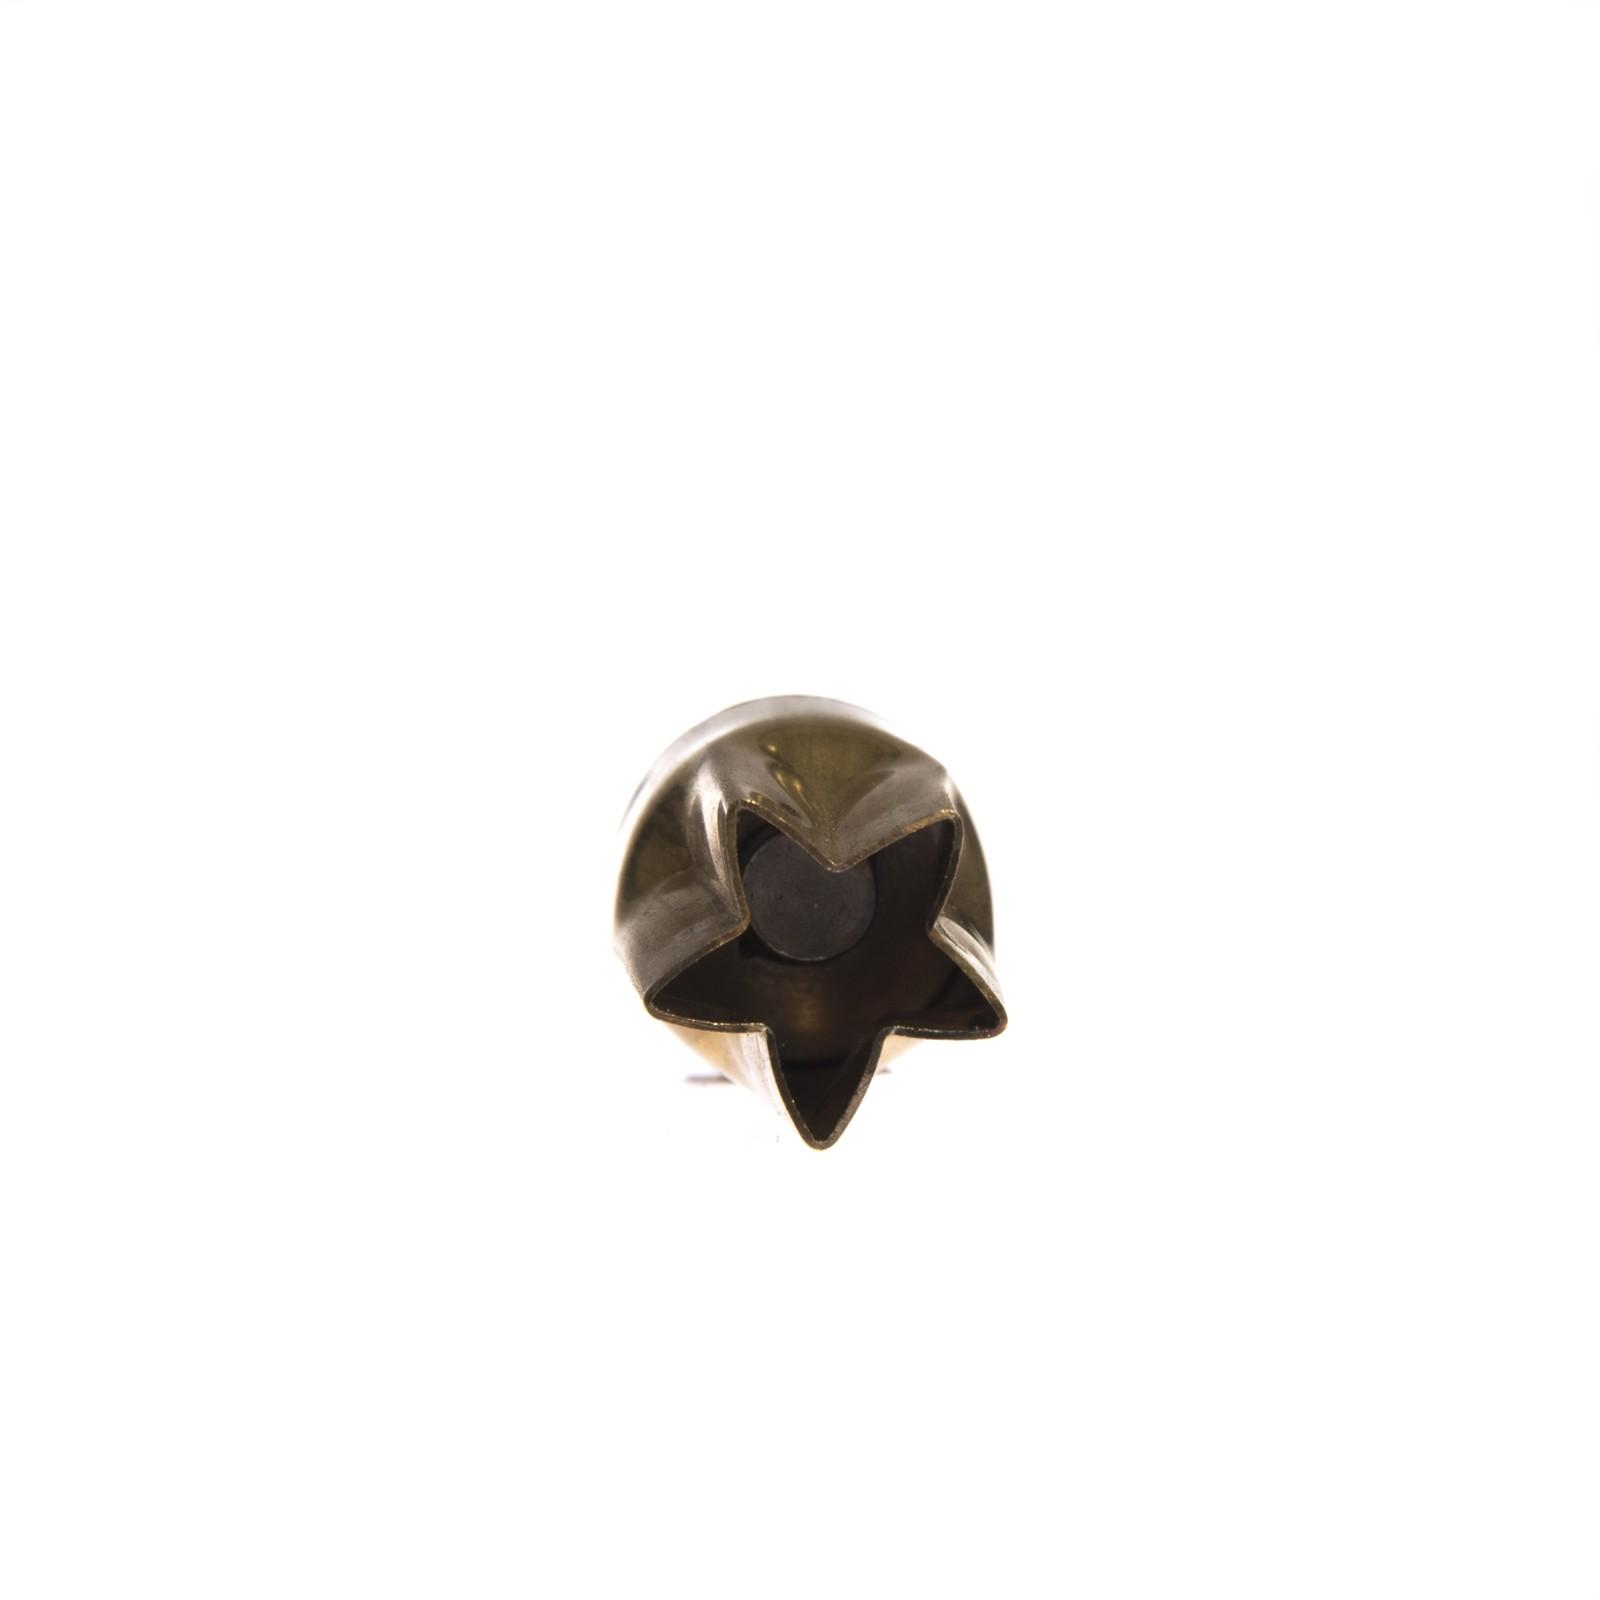 "Kemper Pattern Cutter - Star 13mm (1/2"")"